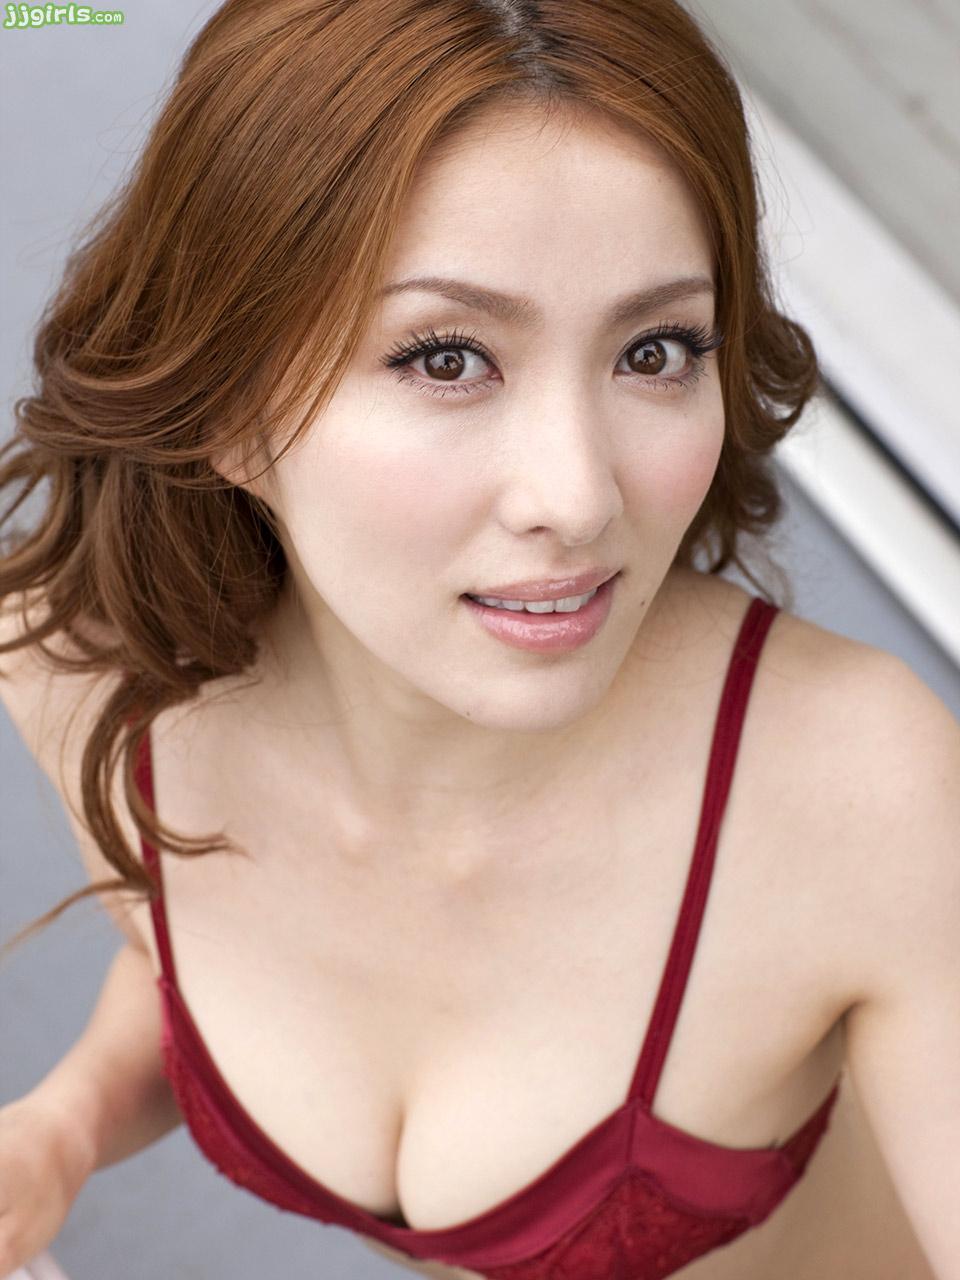 Adult gallery model